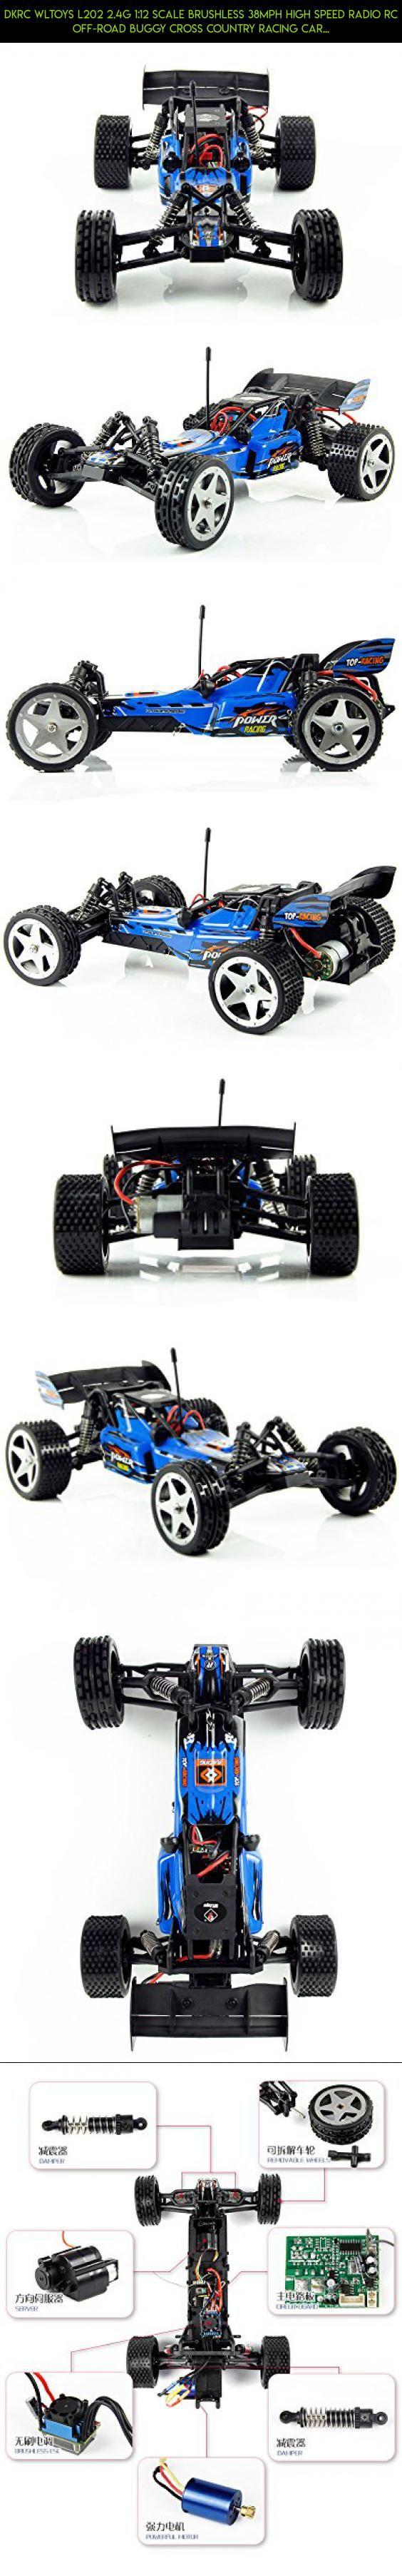 Off Road Racing: Off Road Racing Buggy Plans